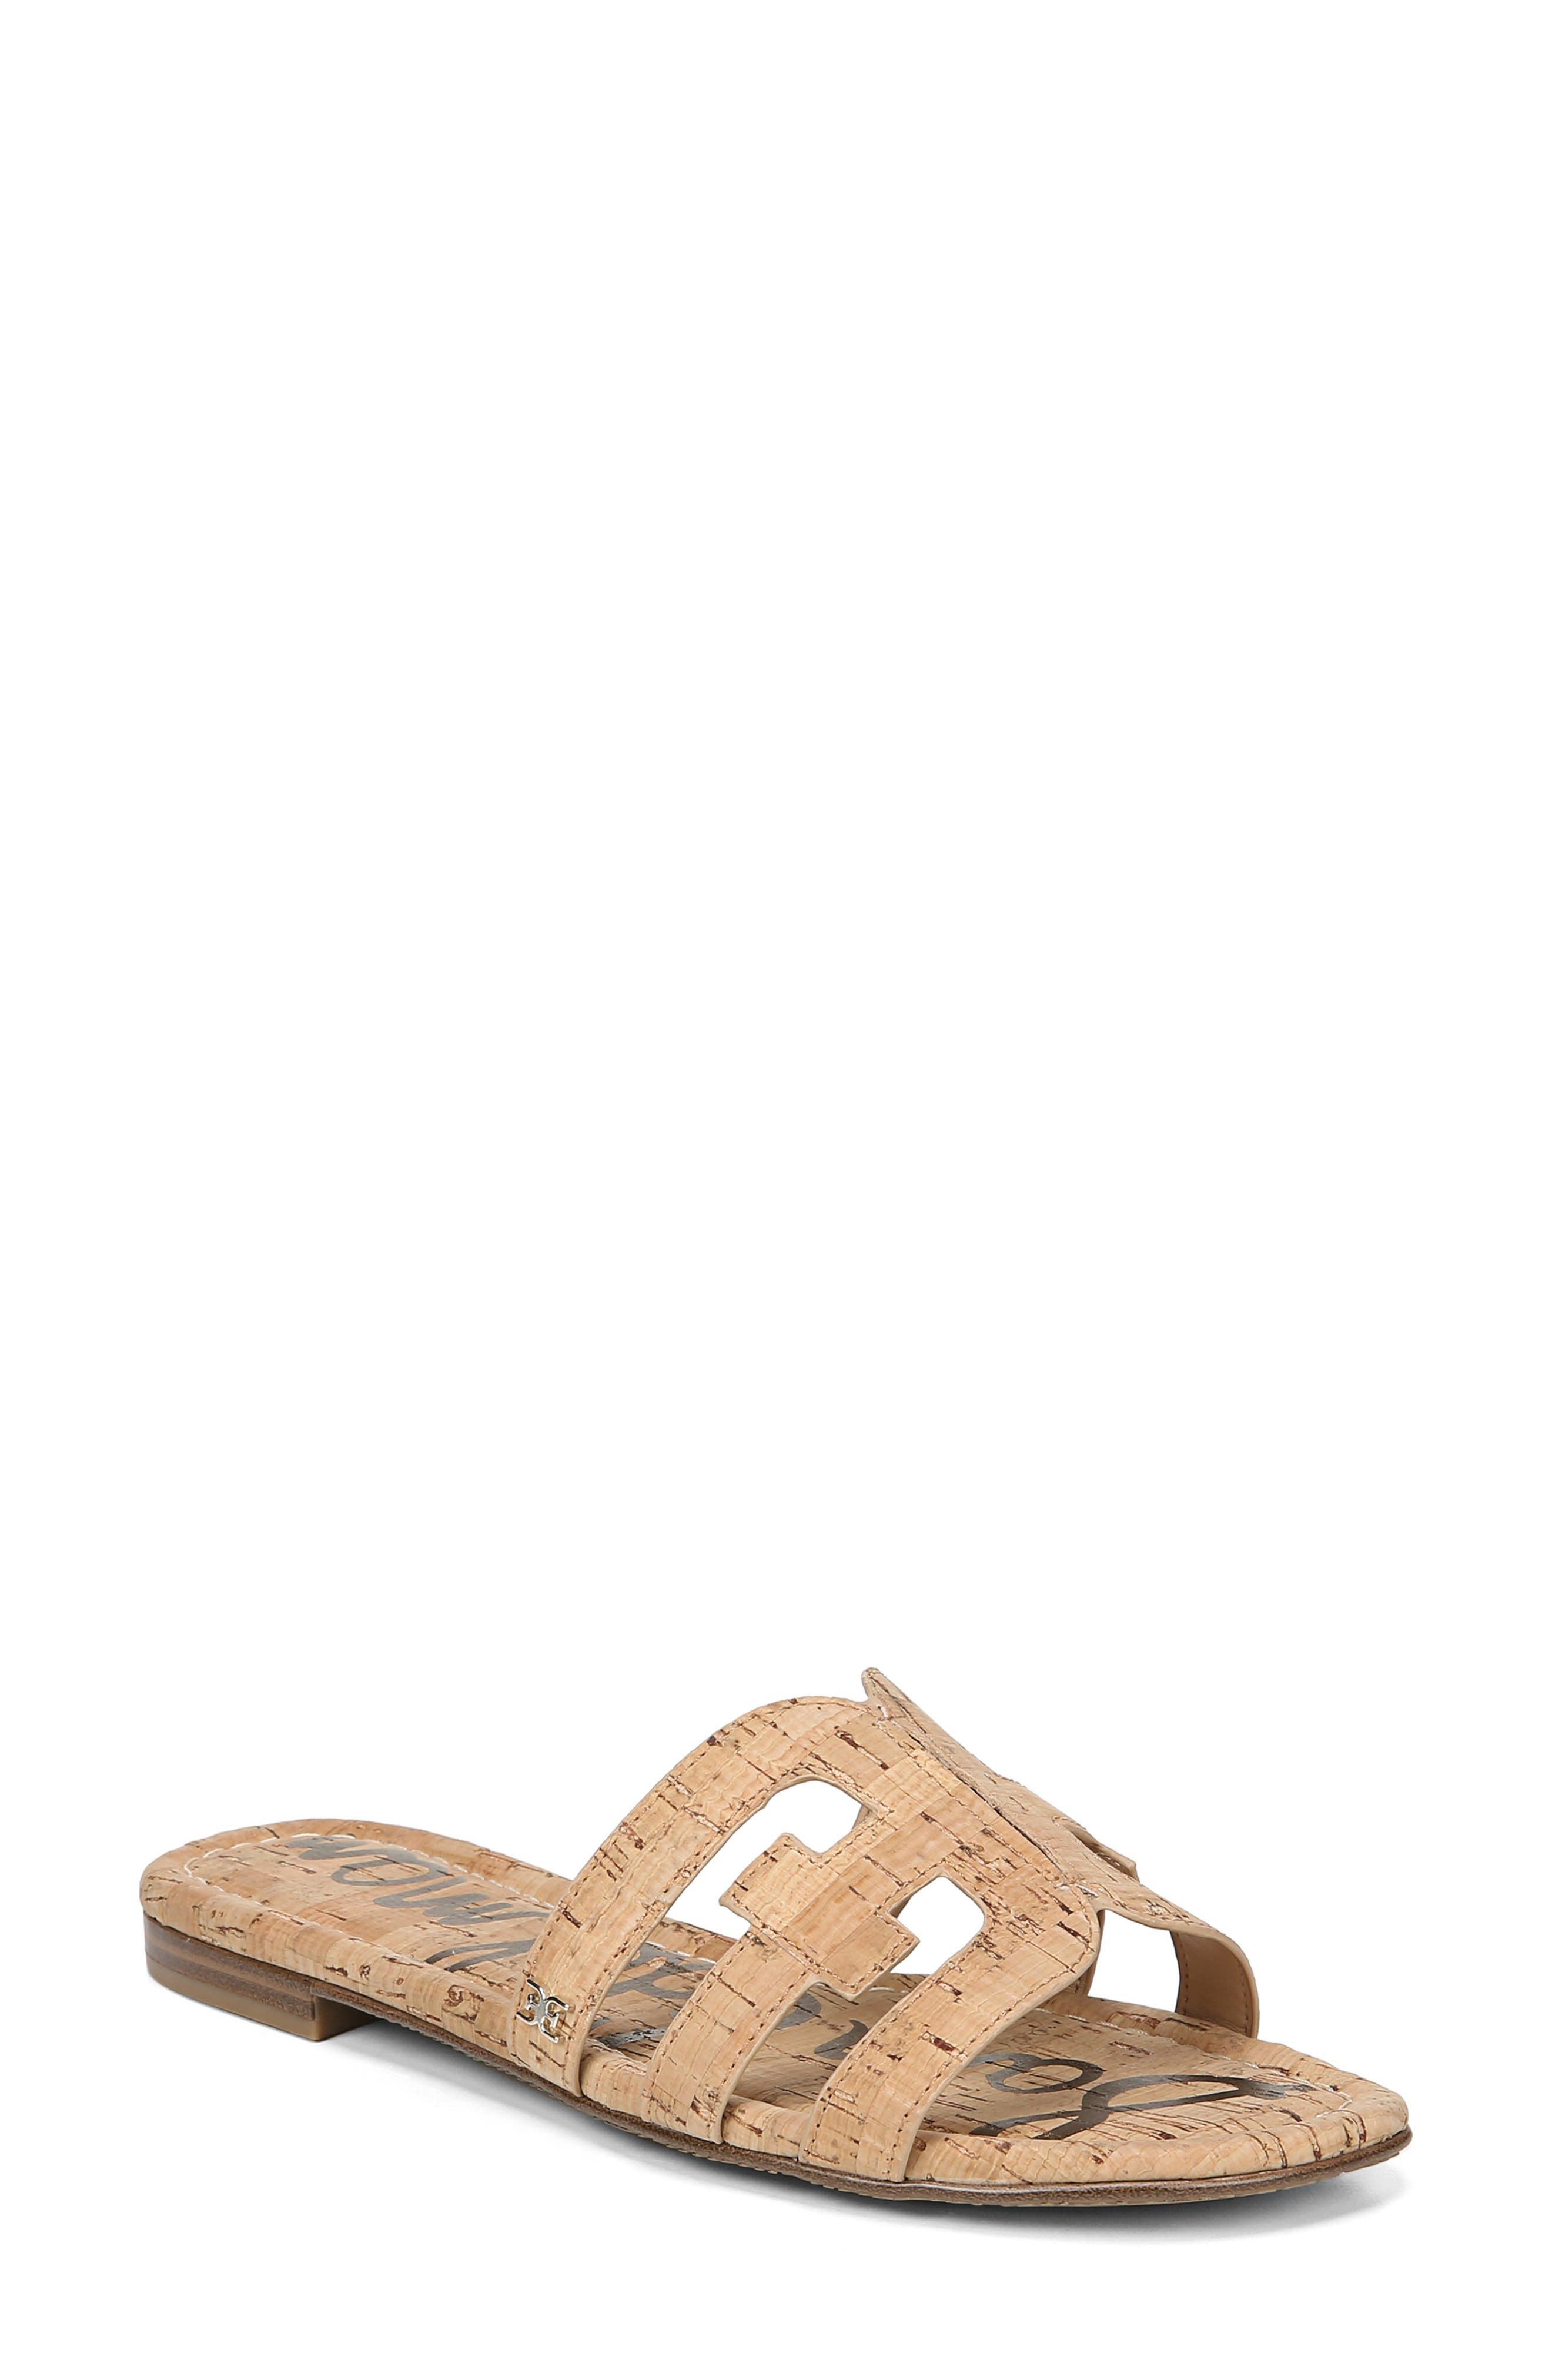 SAM EDELMAN Bay Cutout Slide Sandal, Main, color, NATURAL